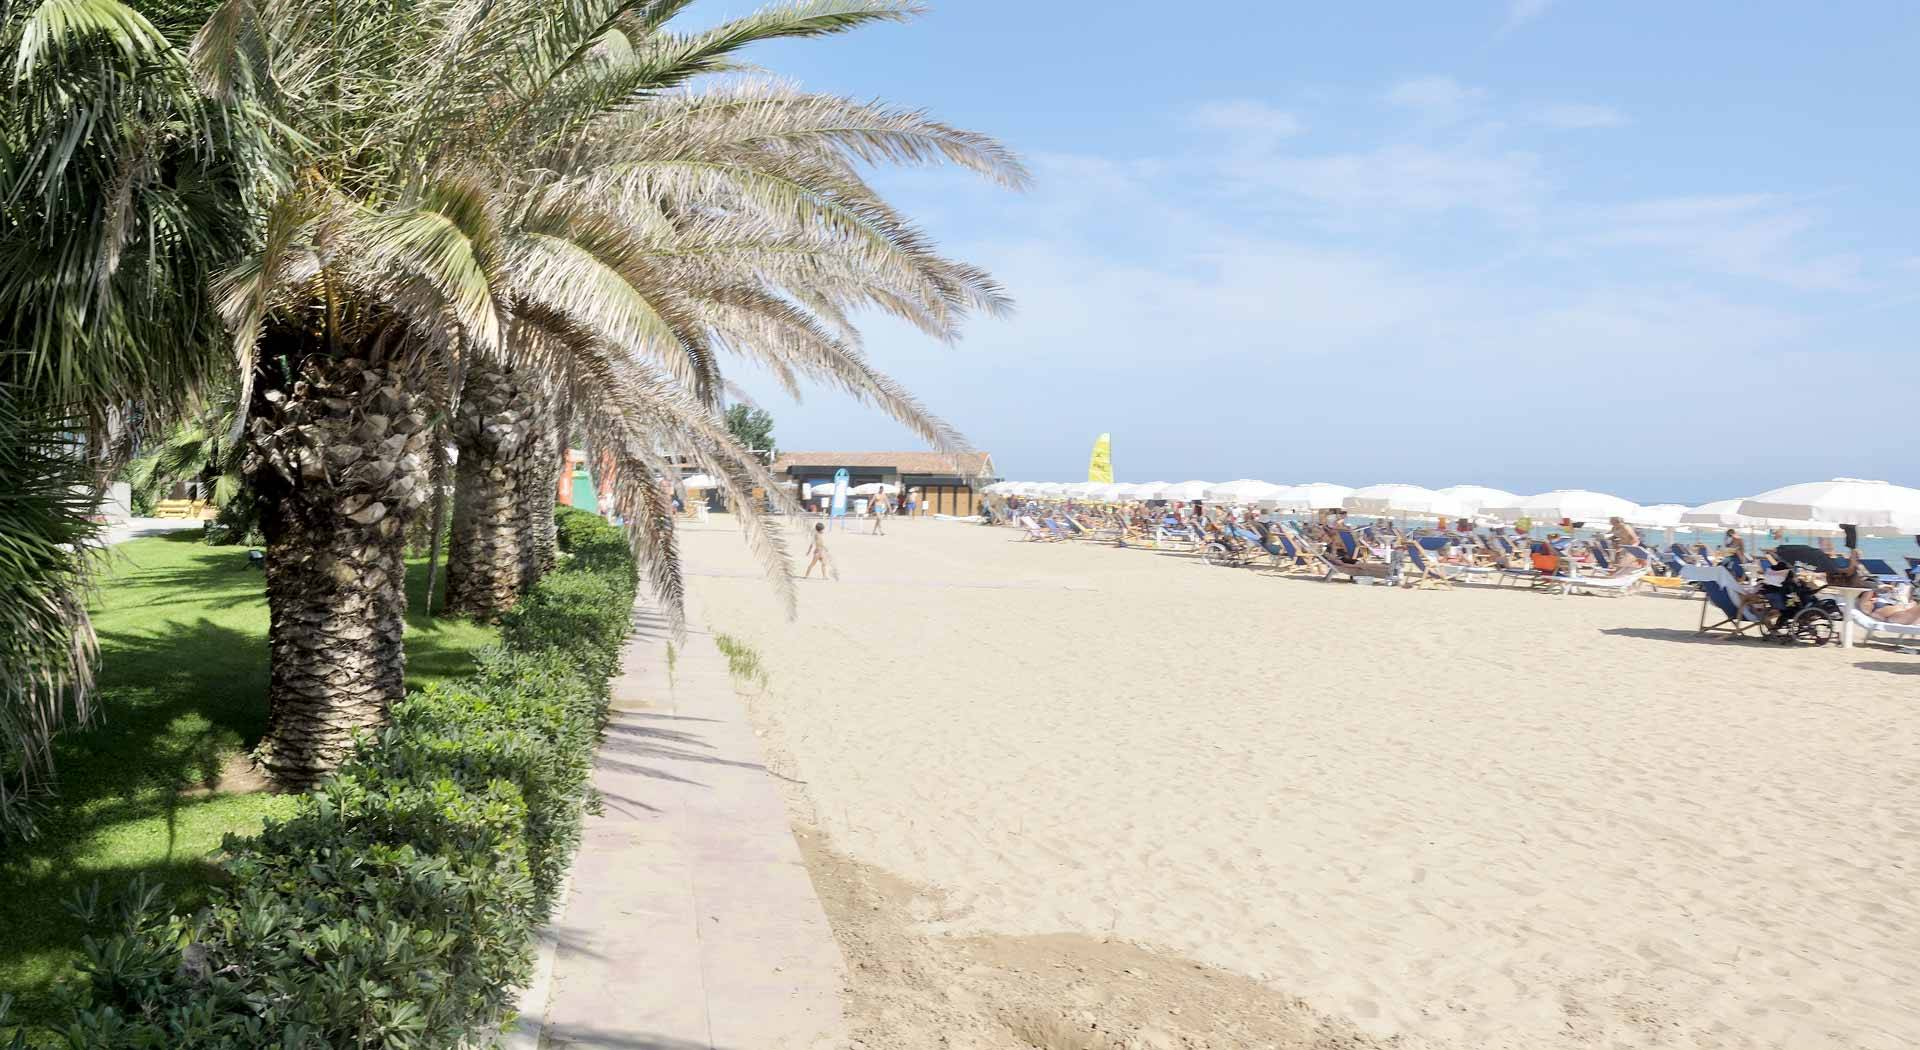 Spiaggia di Silvi Marina